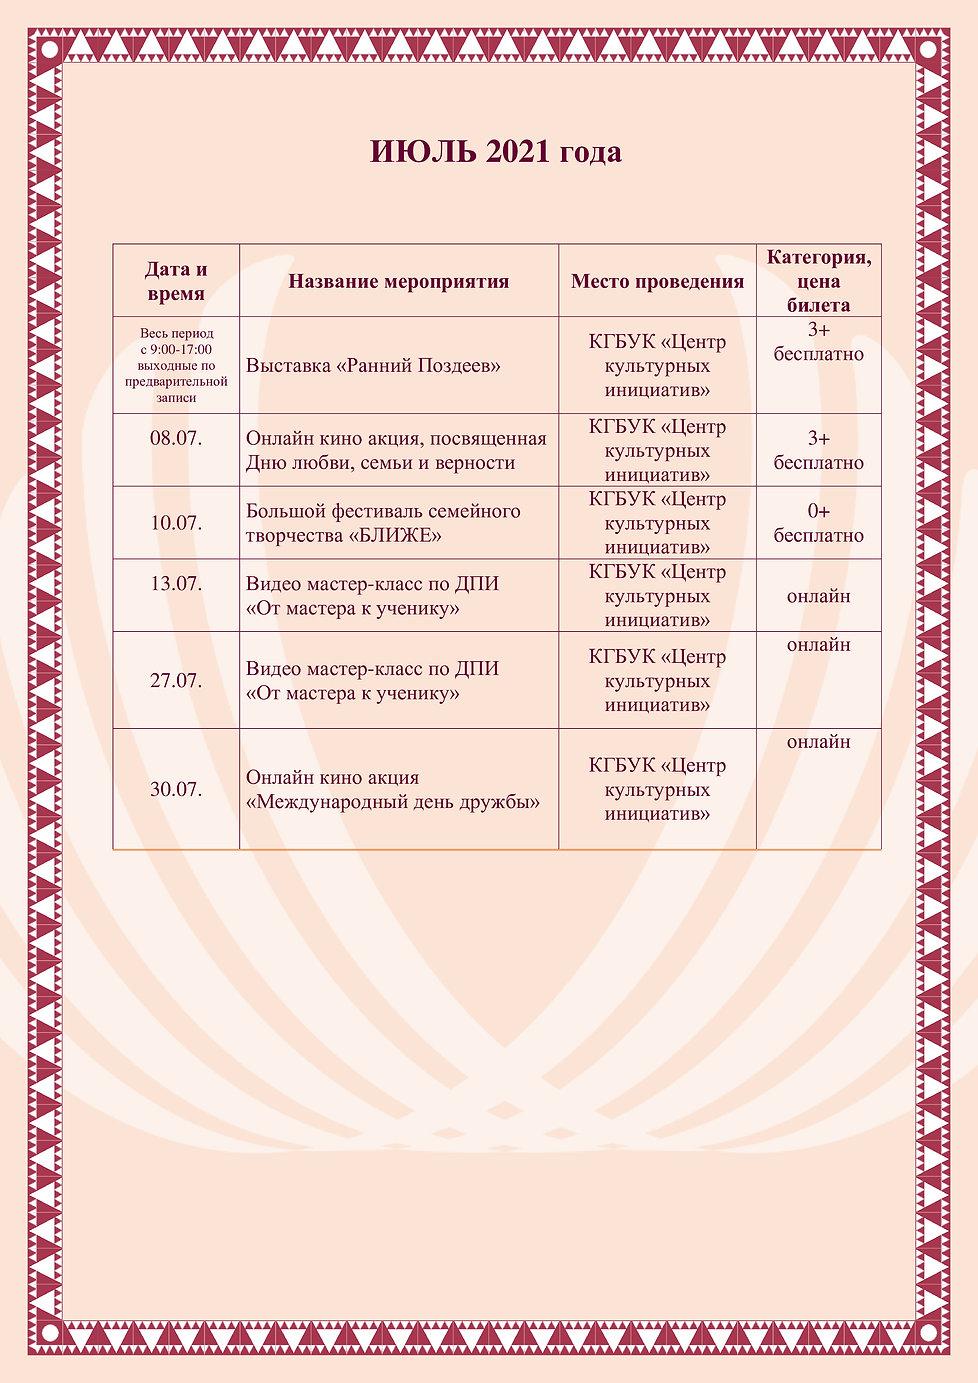 plan_na_vakhtu-_1_ (1).jpg